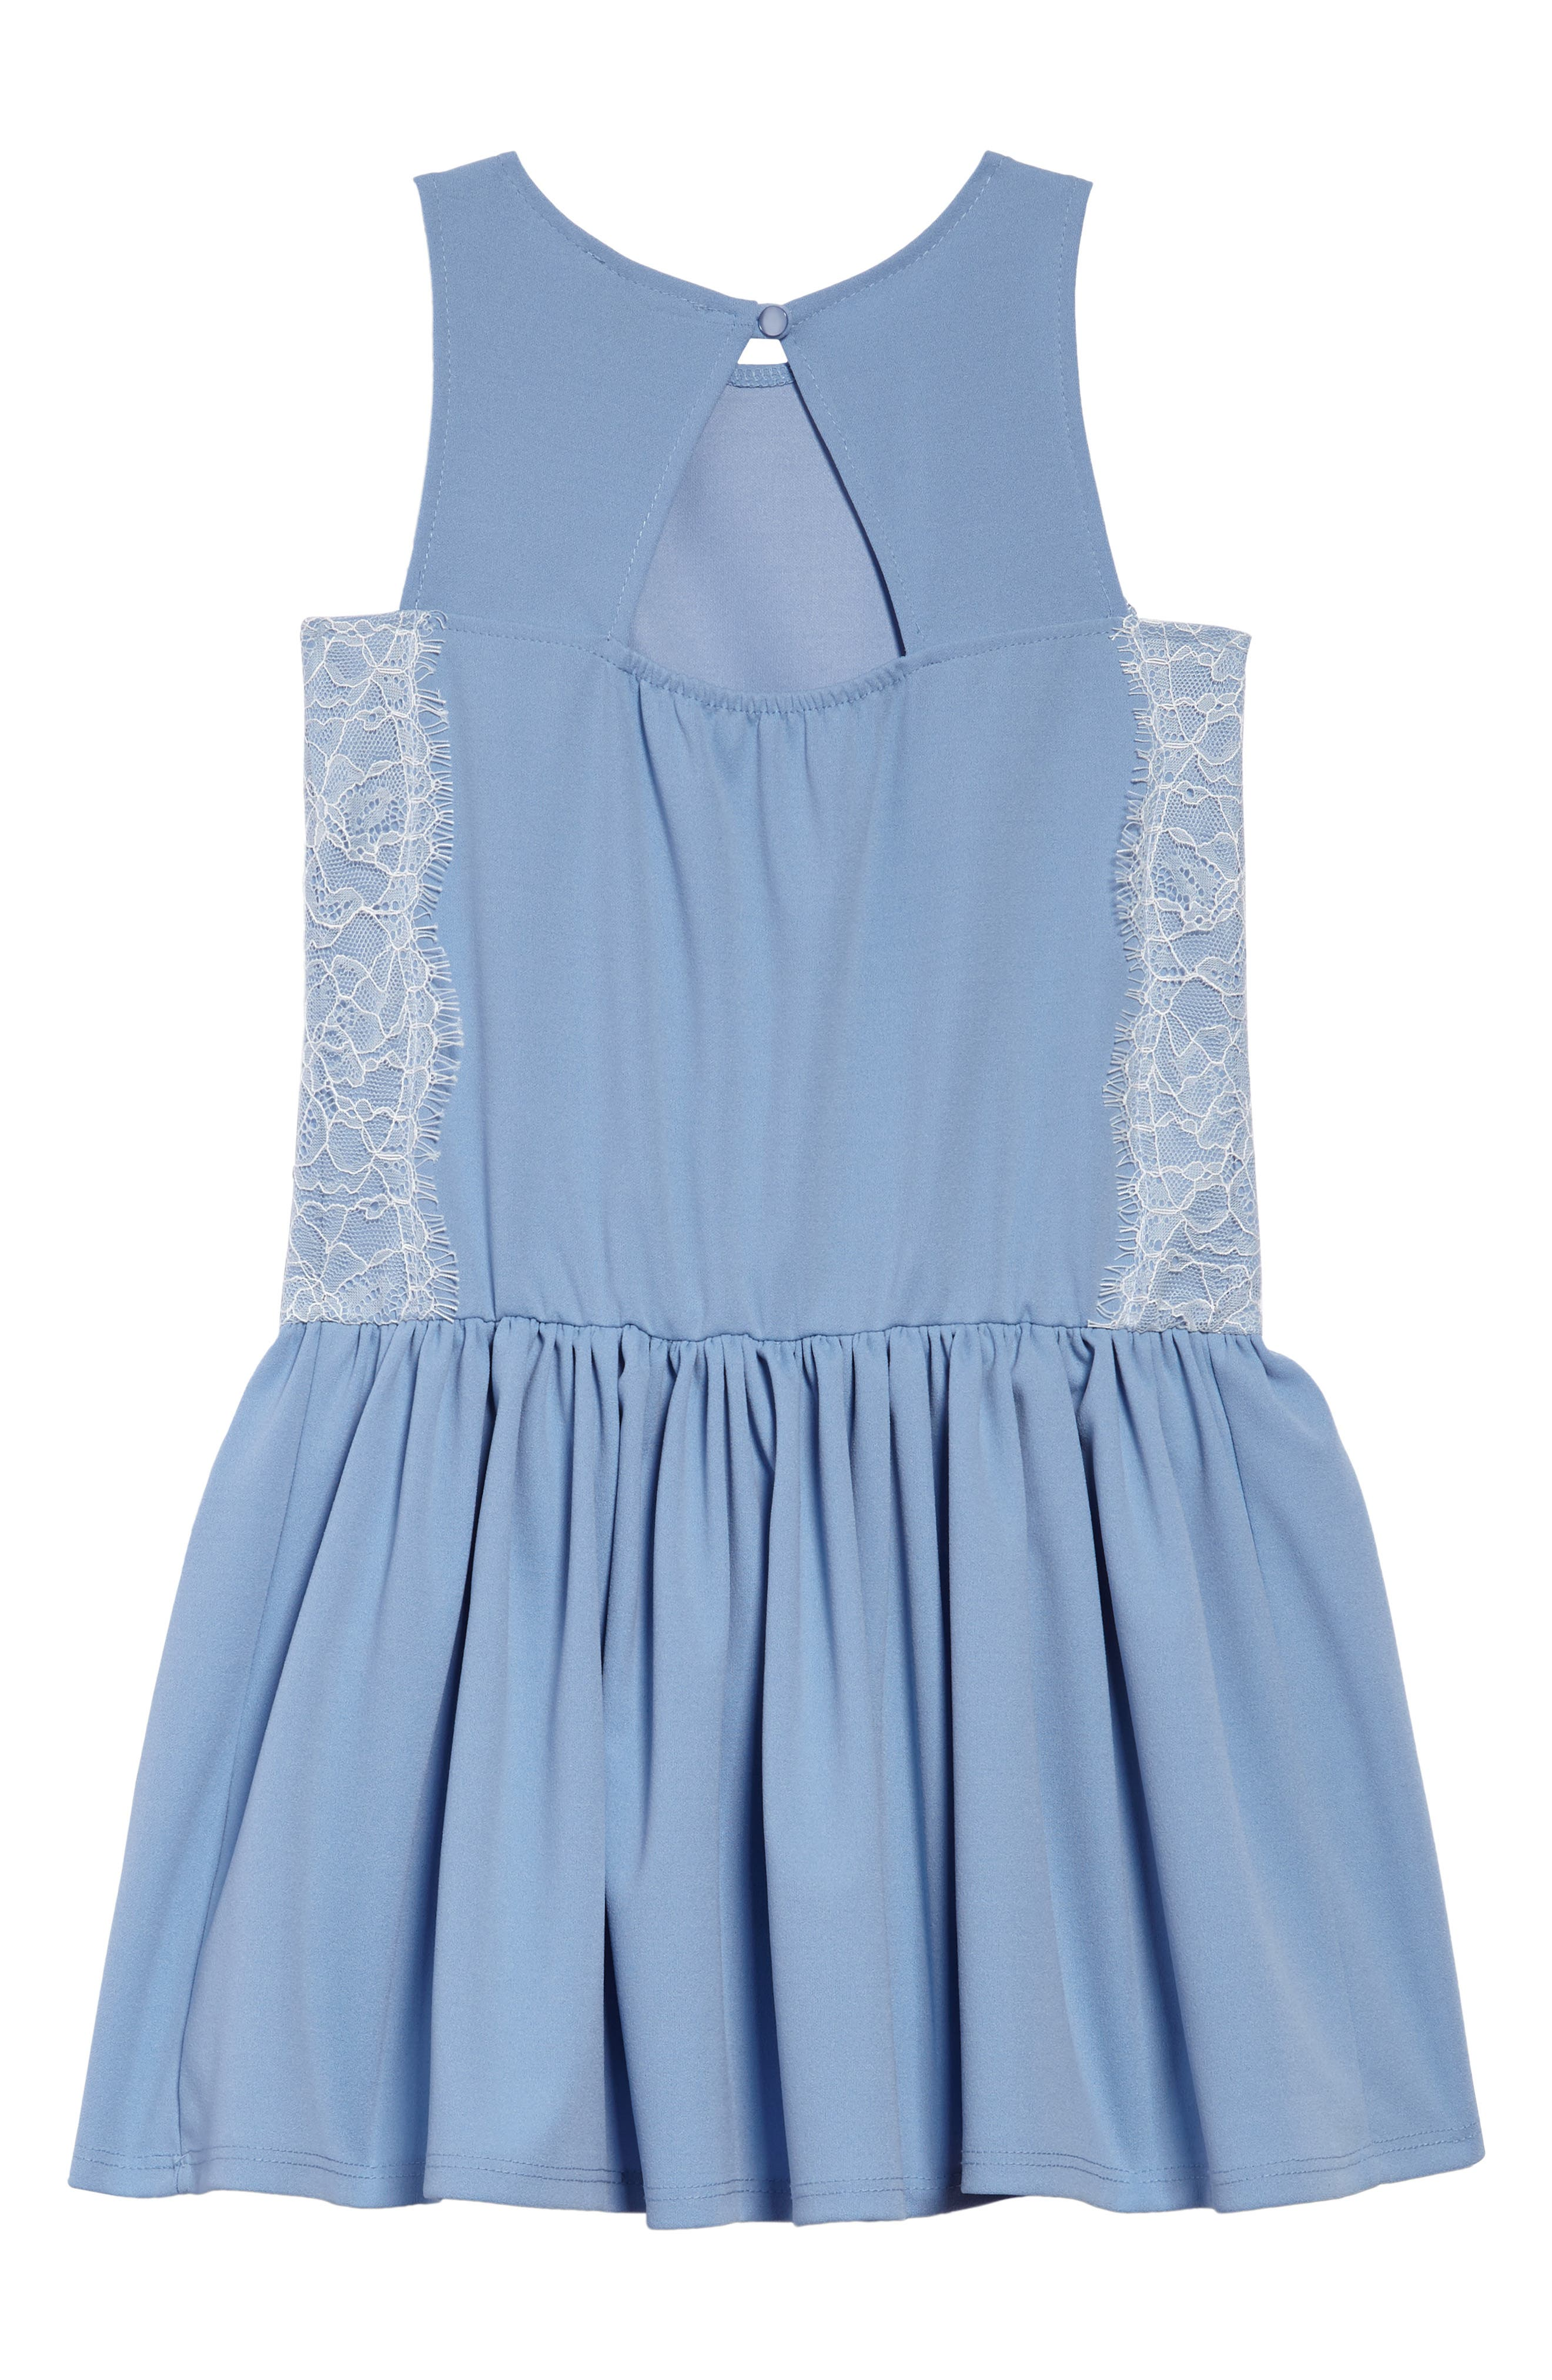 Drop Waist Dress,                             Alternate thumbnail 2, color,                             400